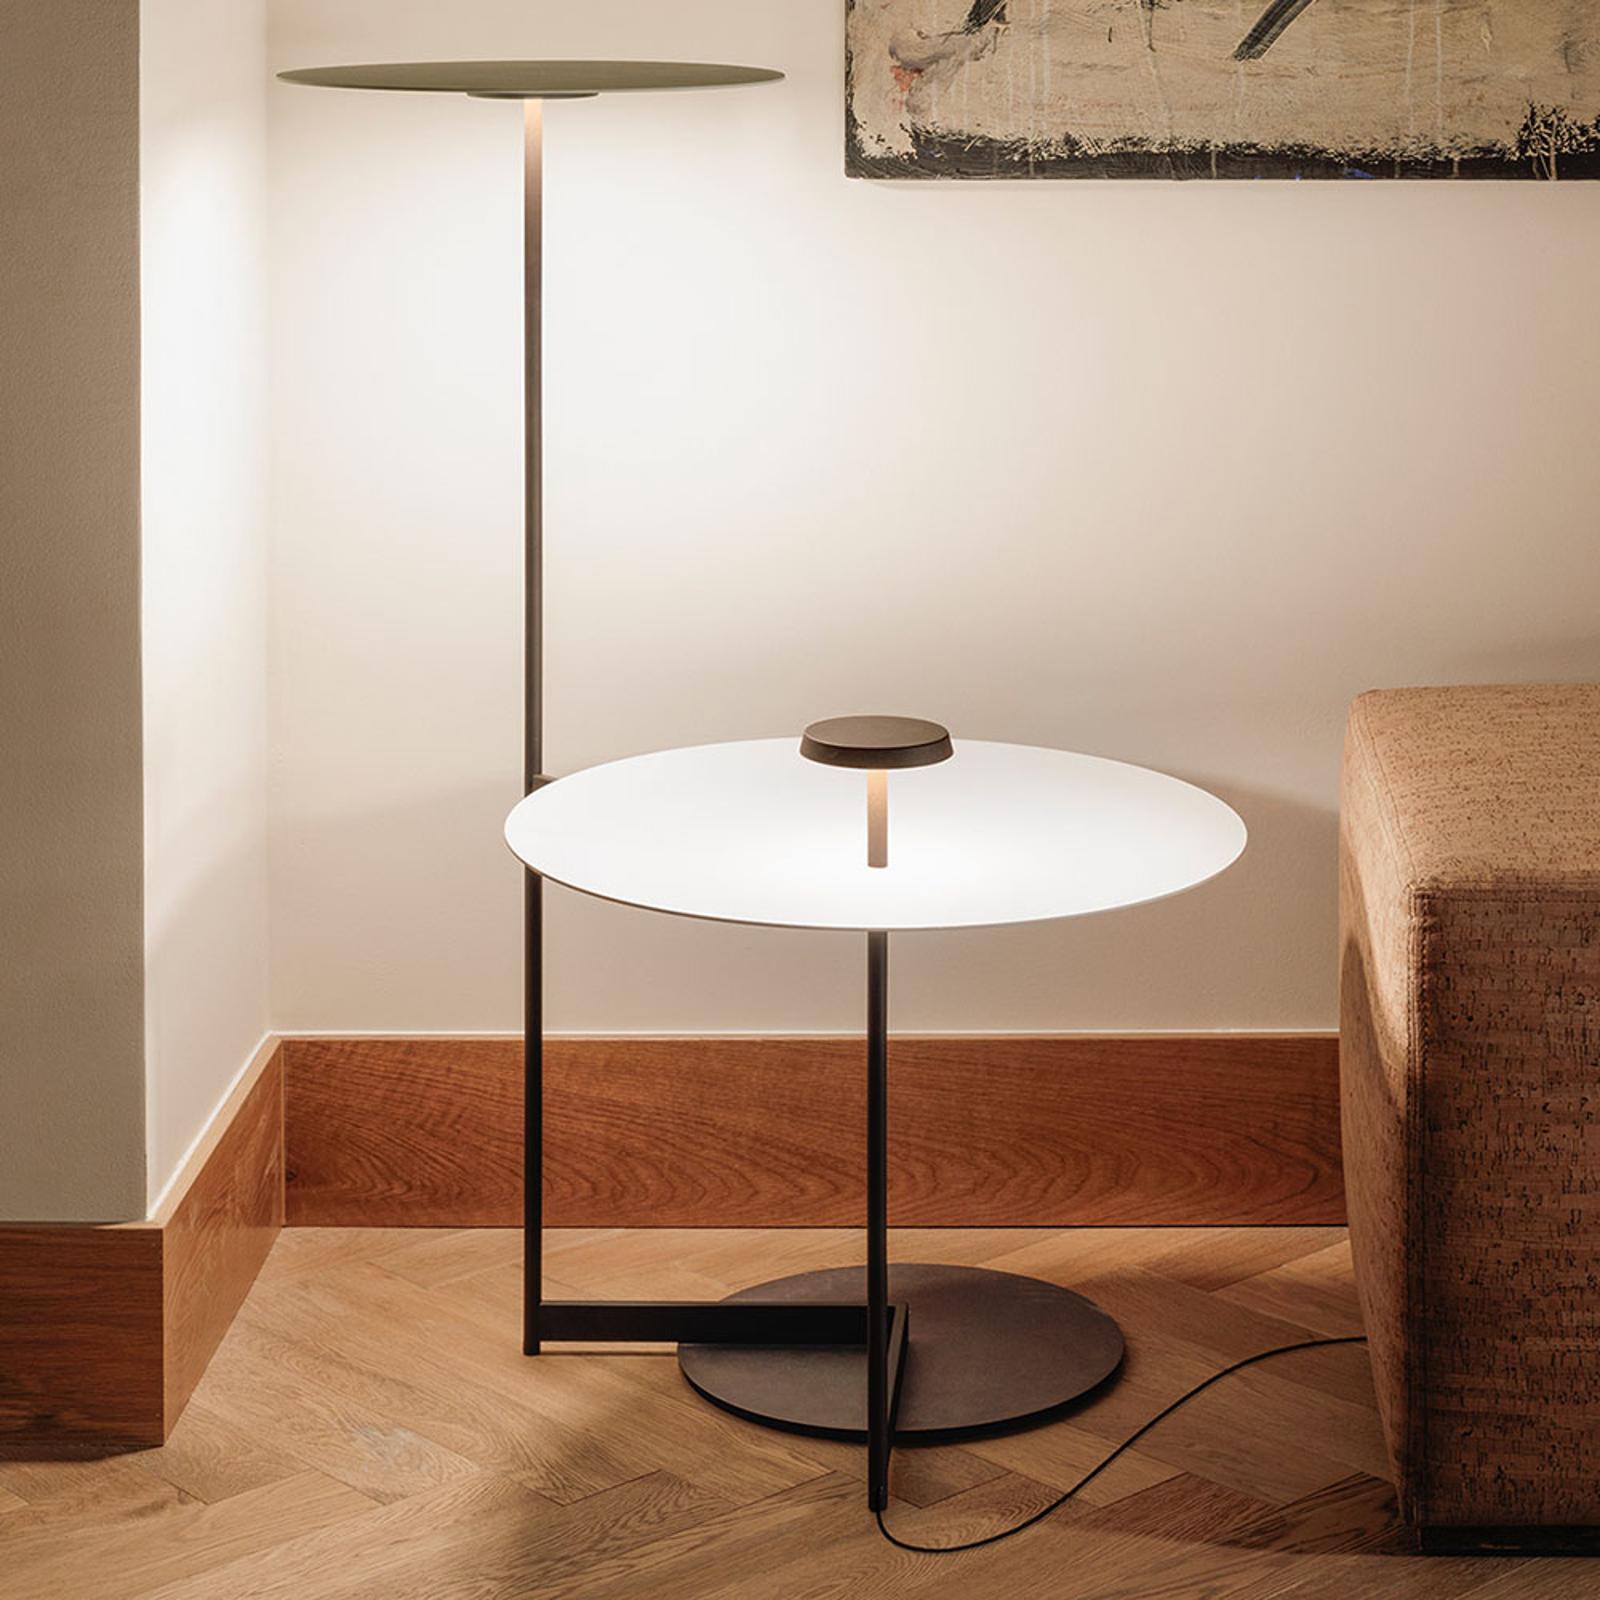 Vibia Flat LED-gulvlampe, 90 cm, grå L1 kan dæmpes